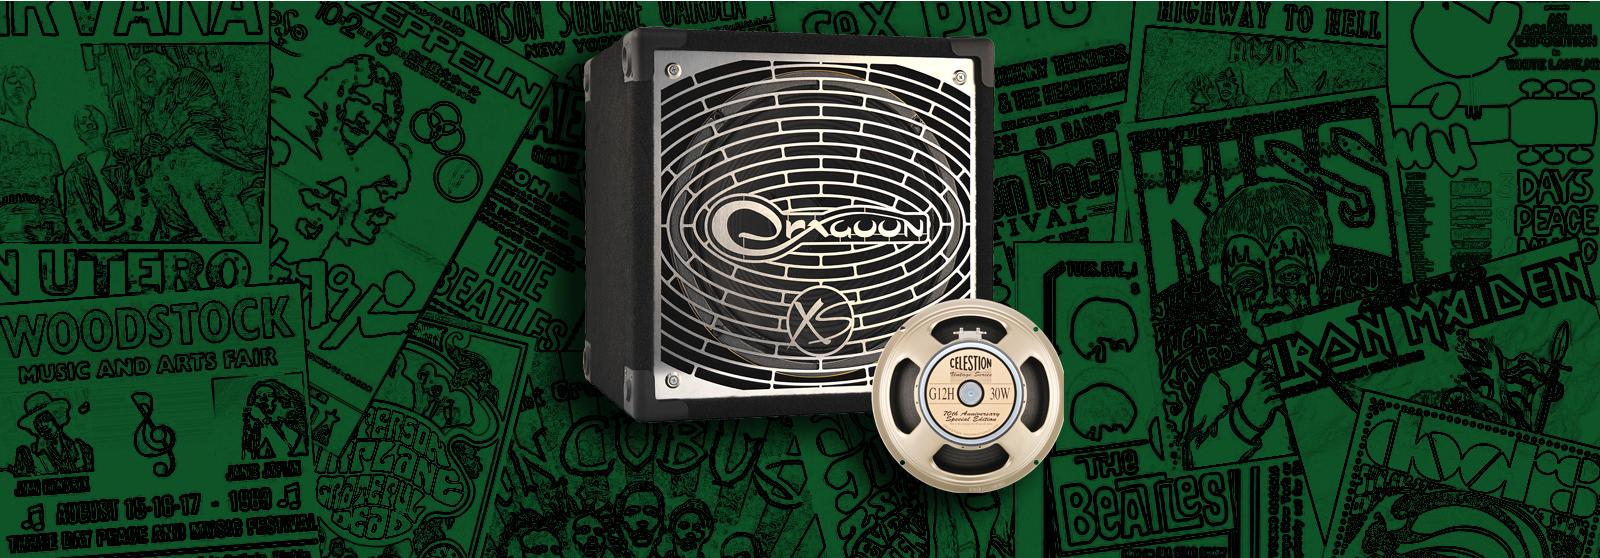 Dragoon - The Custom Speaker - DRAGOON-XSH_20160630002522131668.jpg